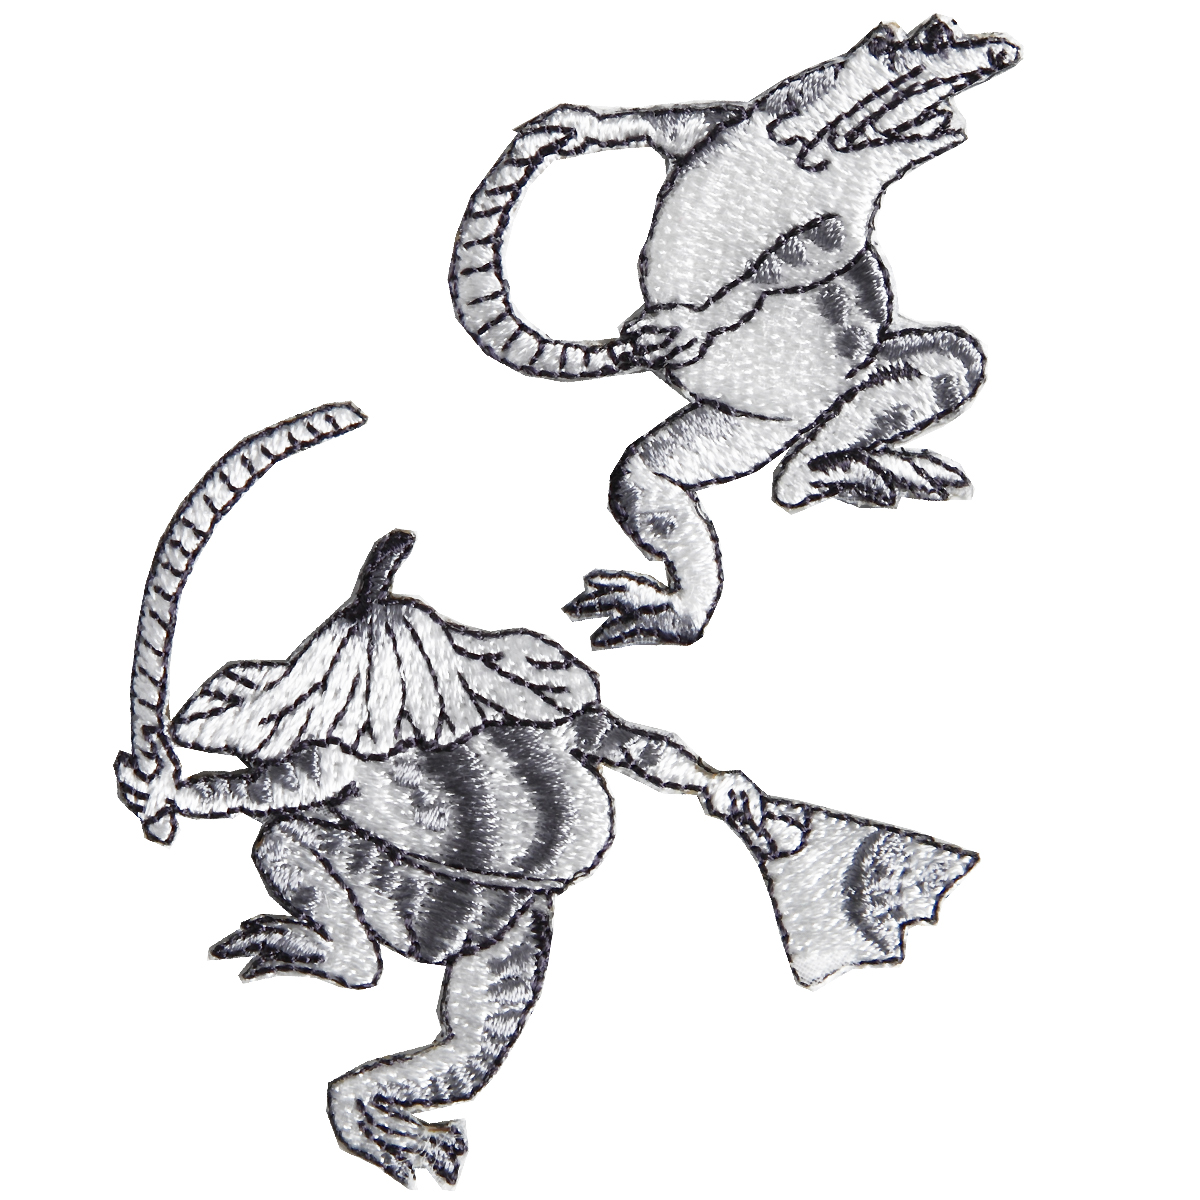 KYWS-678/ワッペン/蛙の田楽/かえるのでんがく/【DM便可】